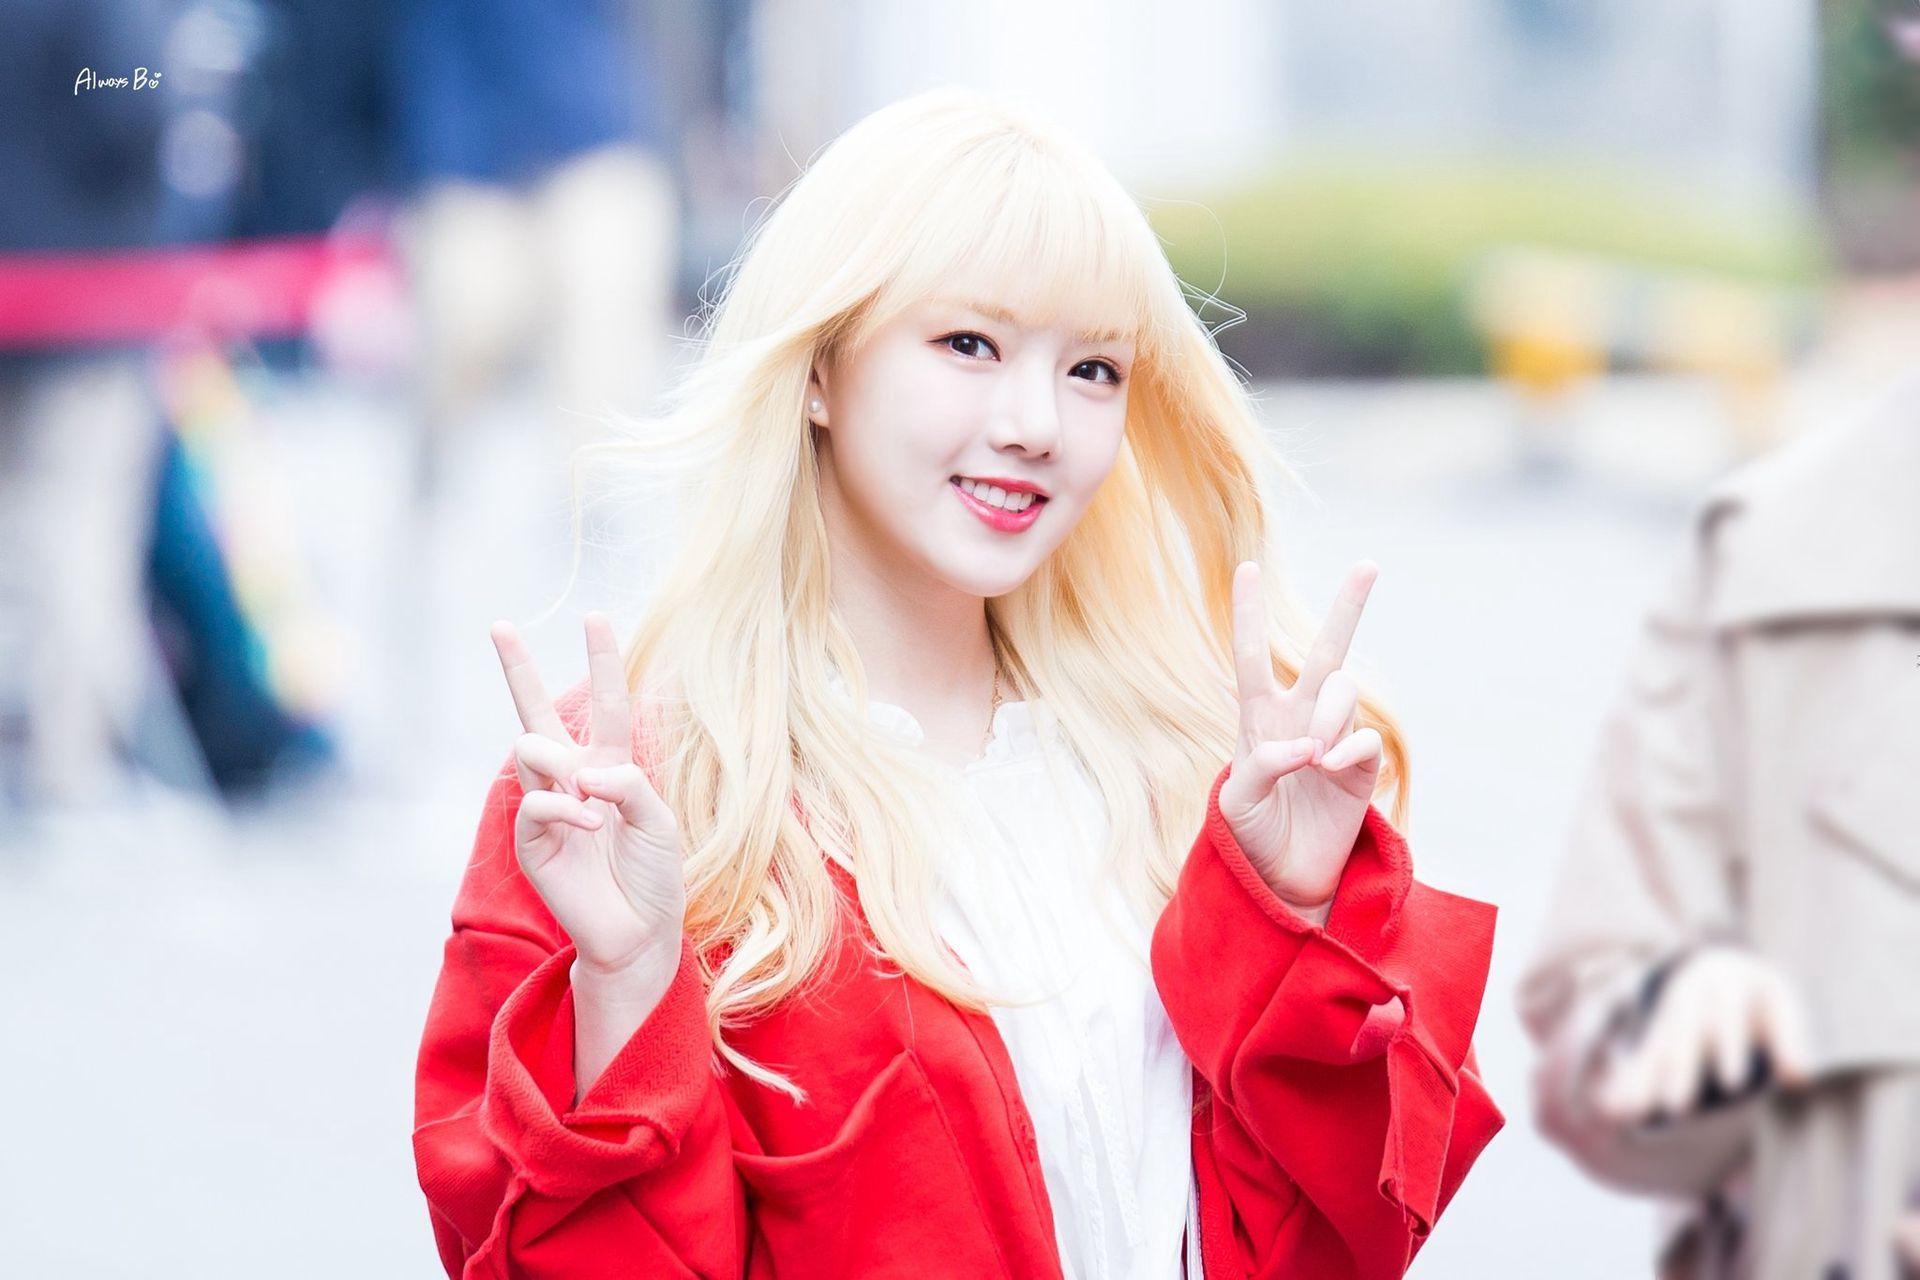 #Choa Park #박초아   Pop hair, Kpop girls, Ideal girl